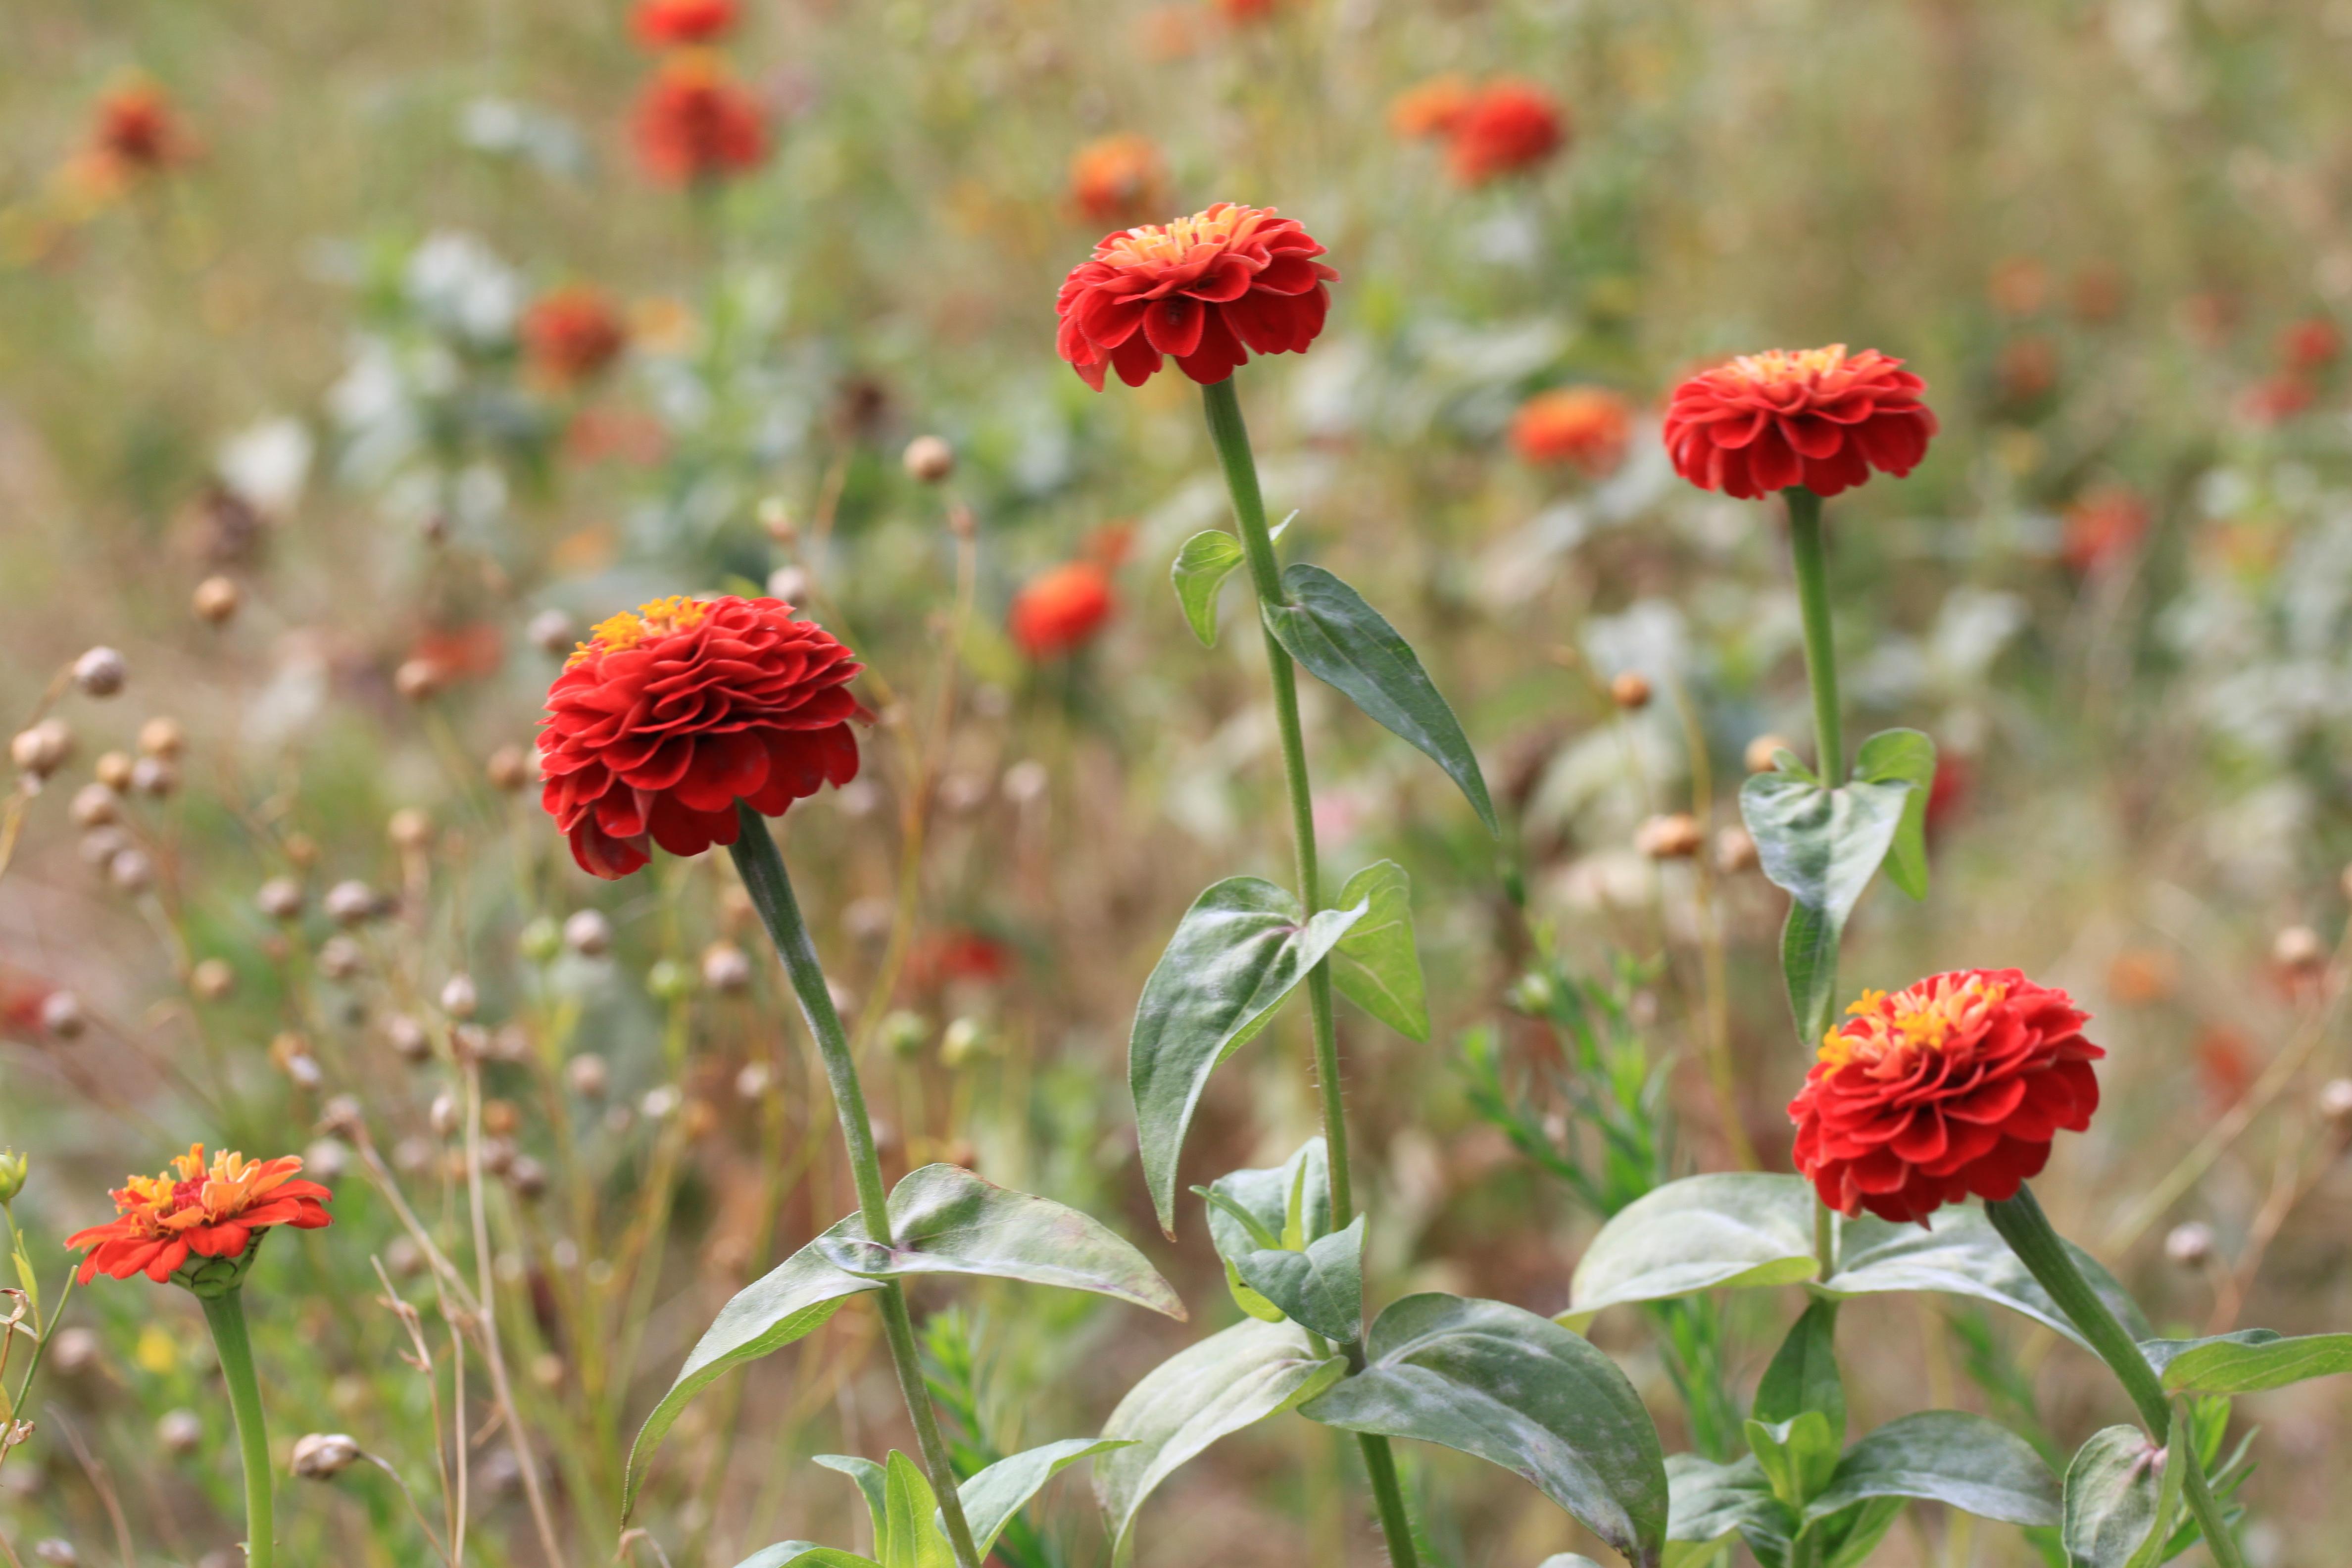 file prairie fleurs rouges jardin compans caffarelli jpg wikimedia commons. Black Bedroom Furniture Sets. Home Design Ideas